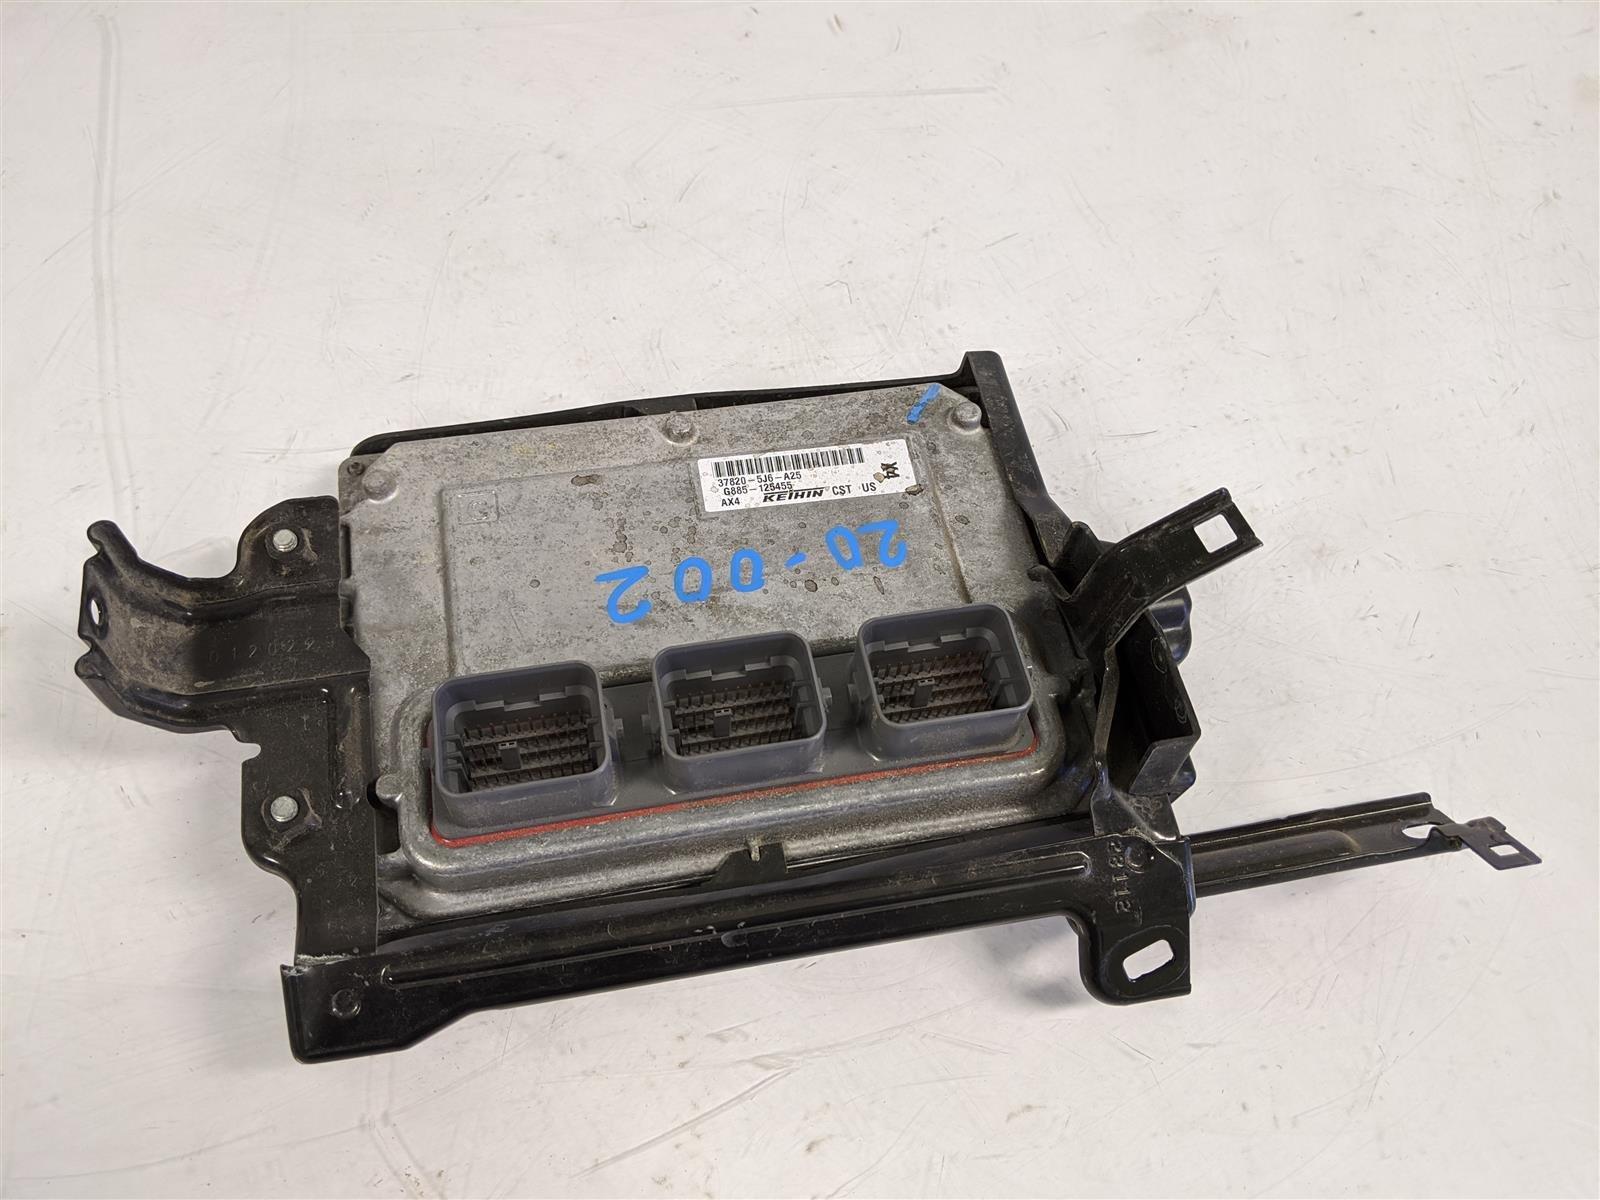 2016 Acura MDX Tech Awd Ecu Control Unit Replacement